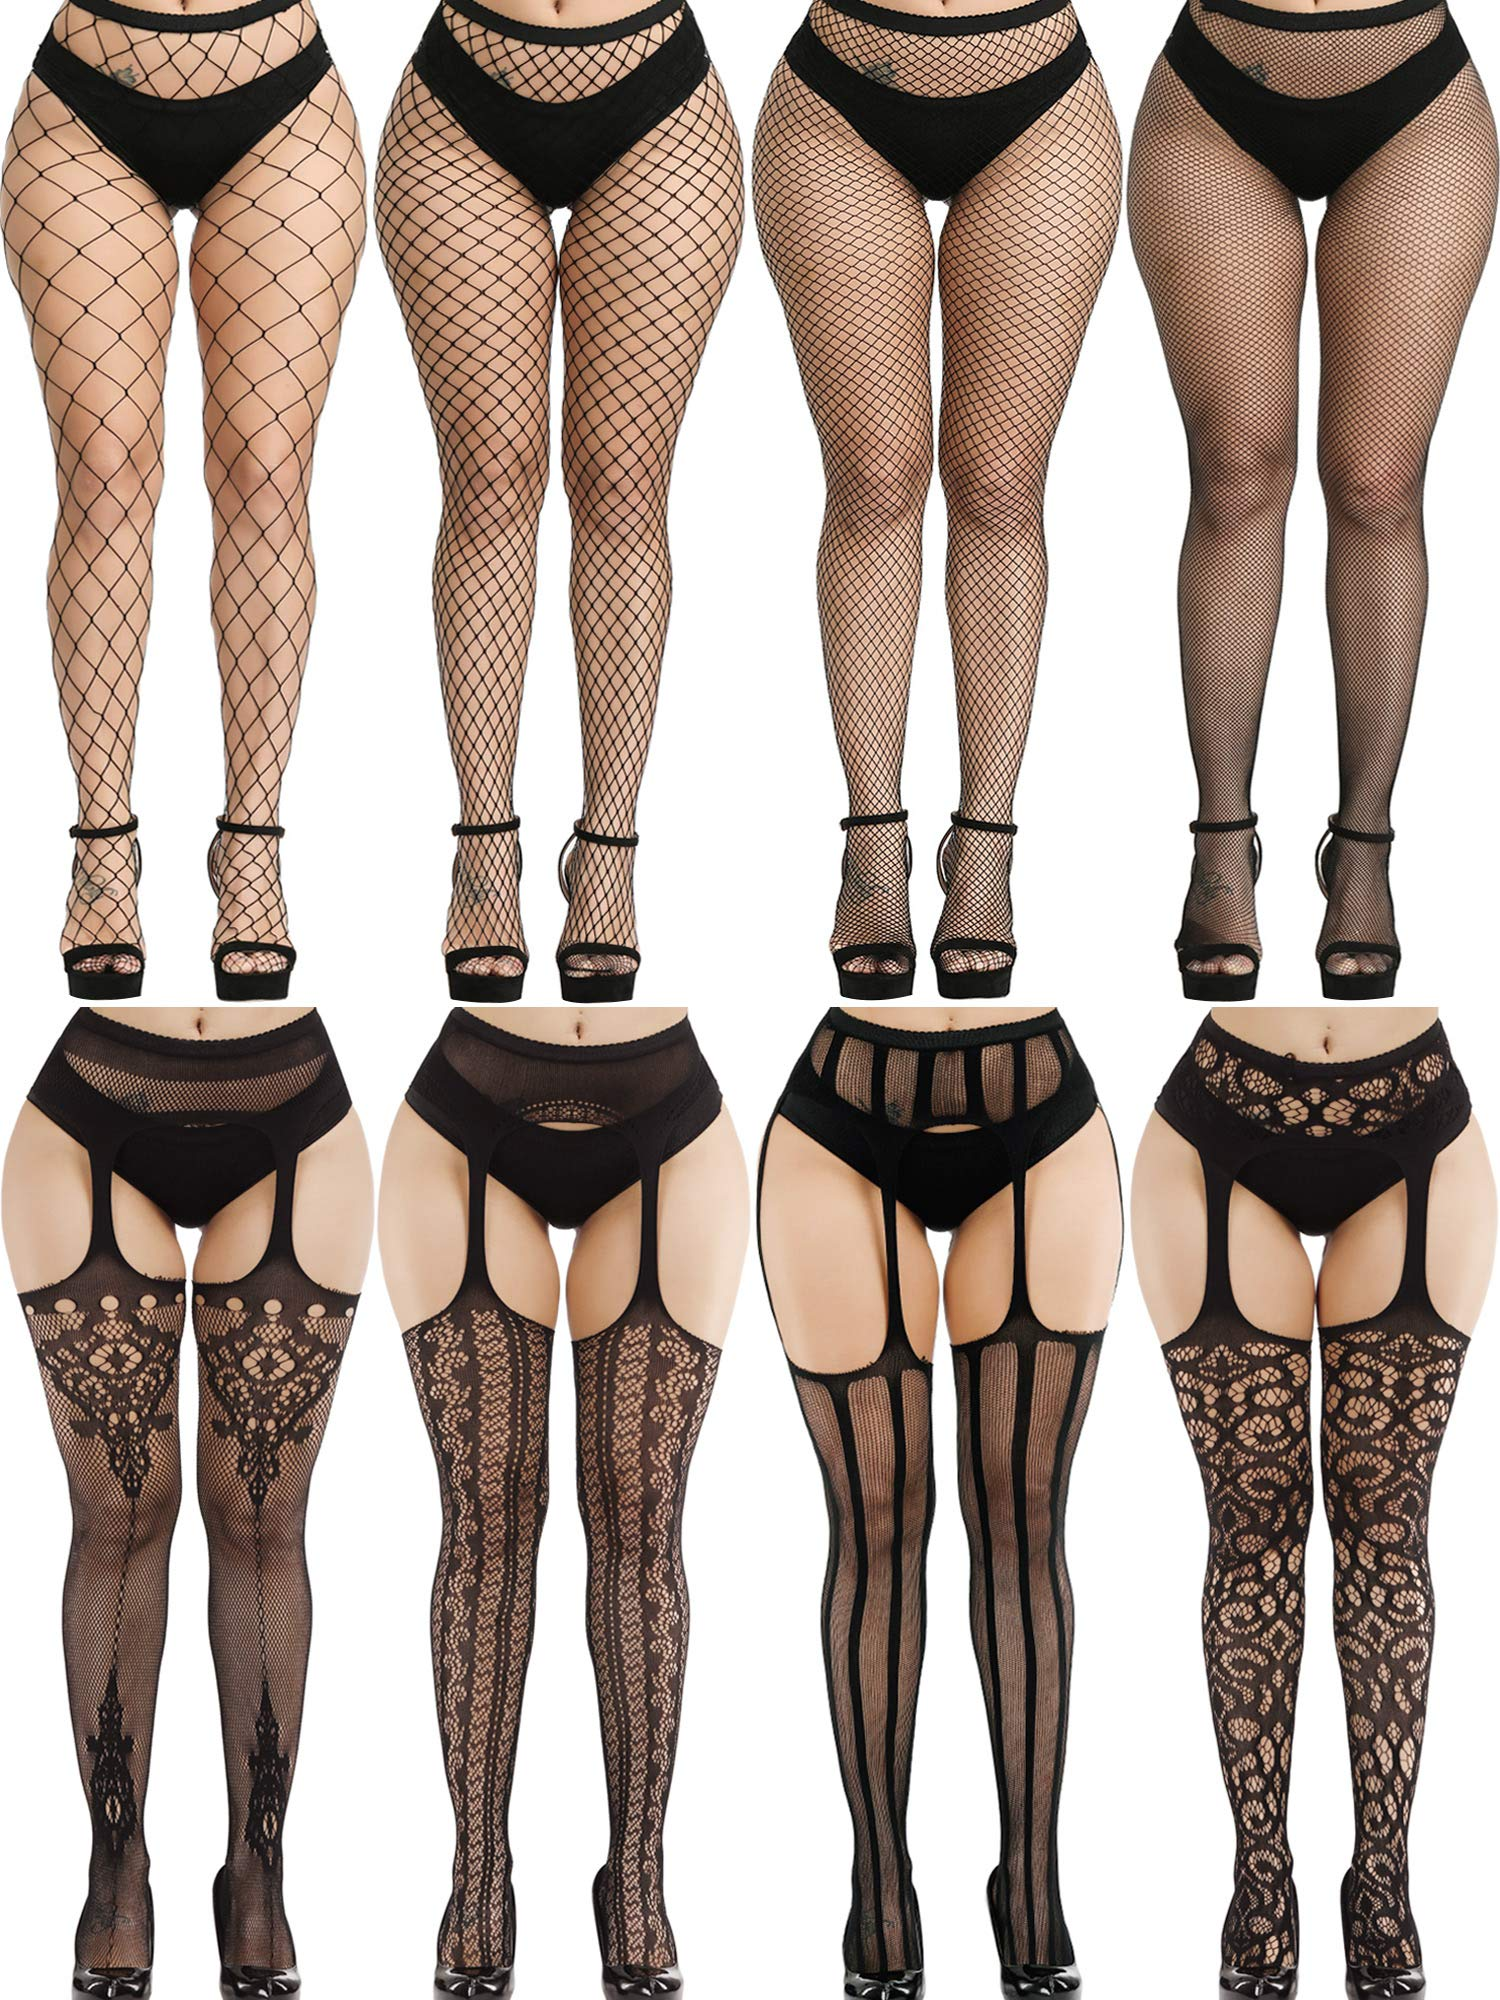 8 Pairs Women Fishnet Stockings Tights Pantyhose Thigh High Stockings Waist Fishnets